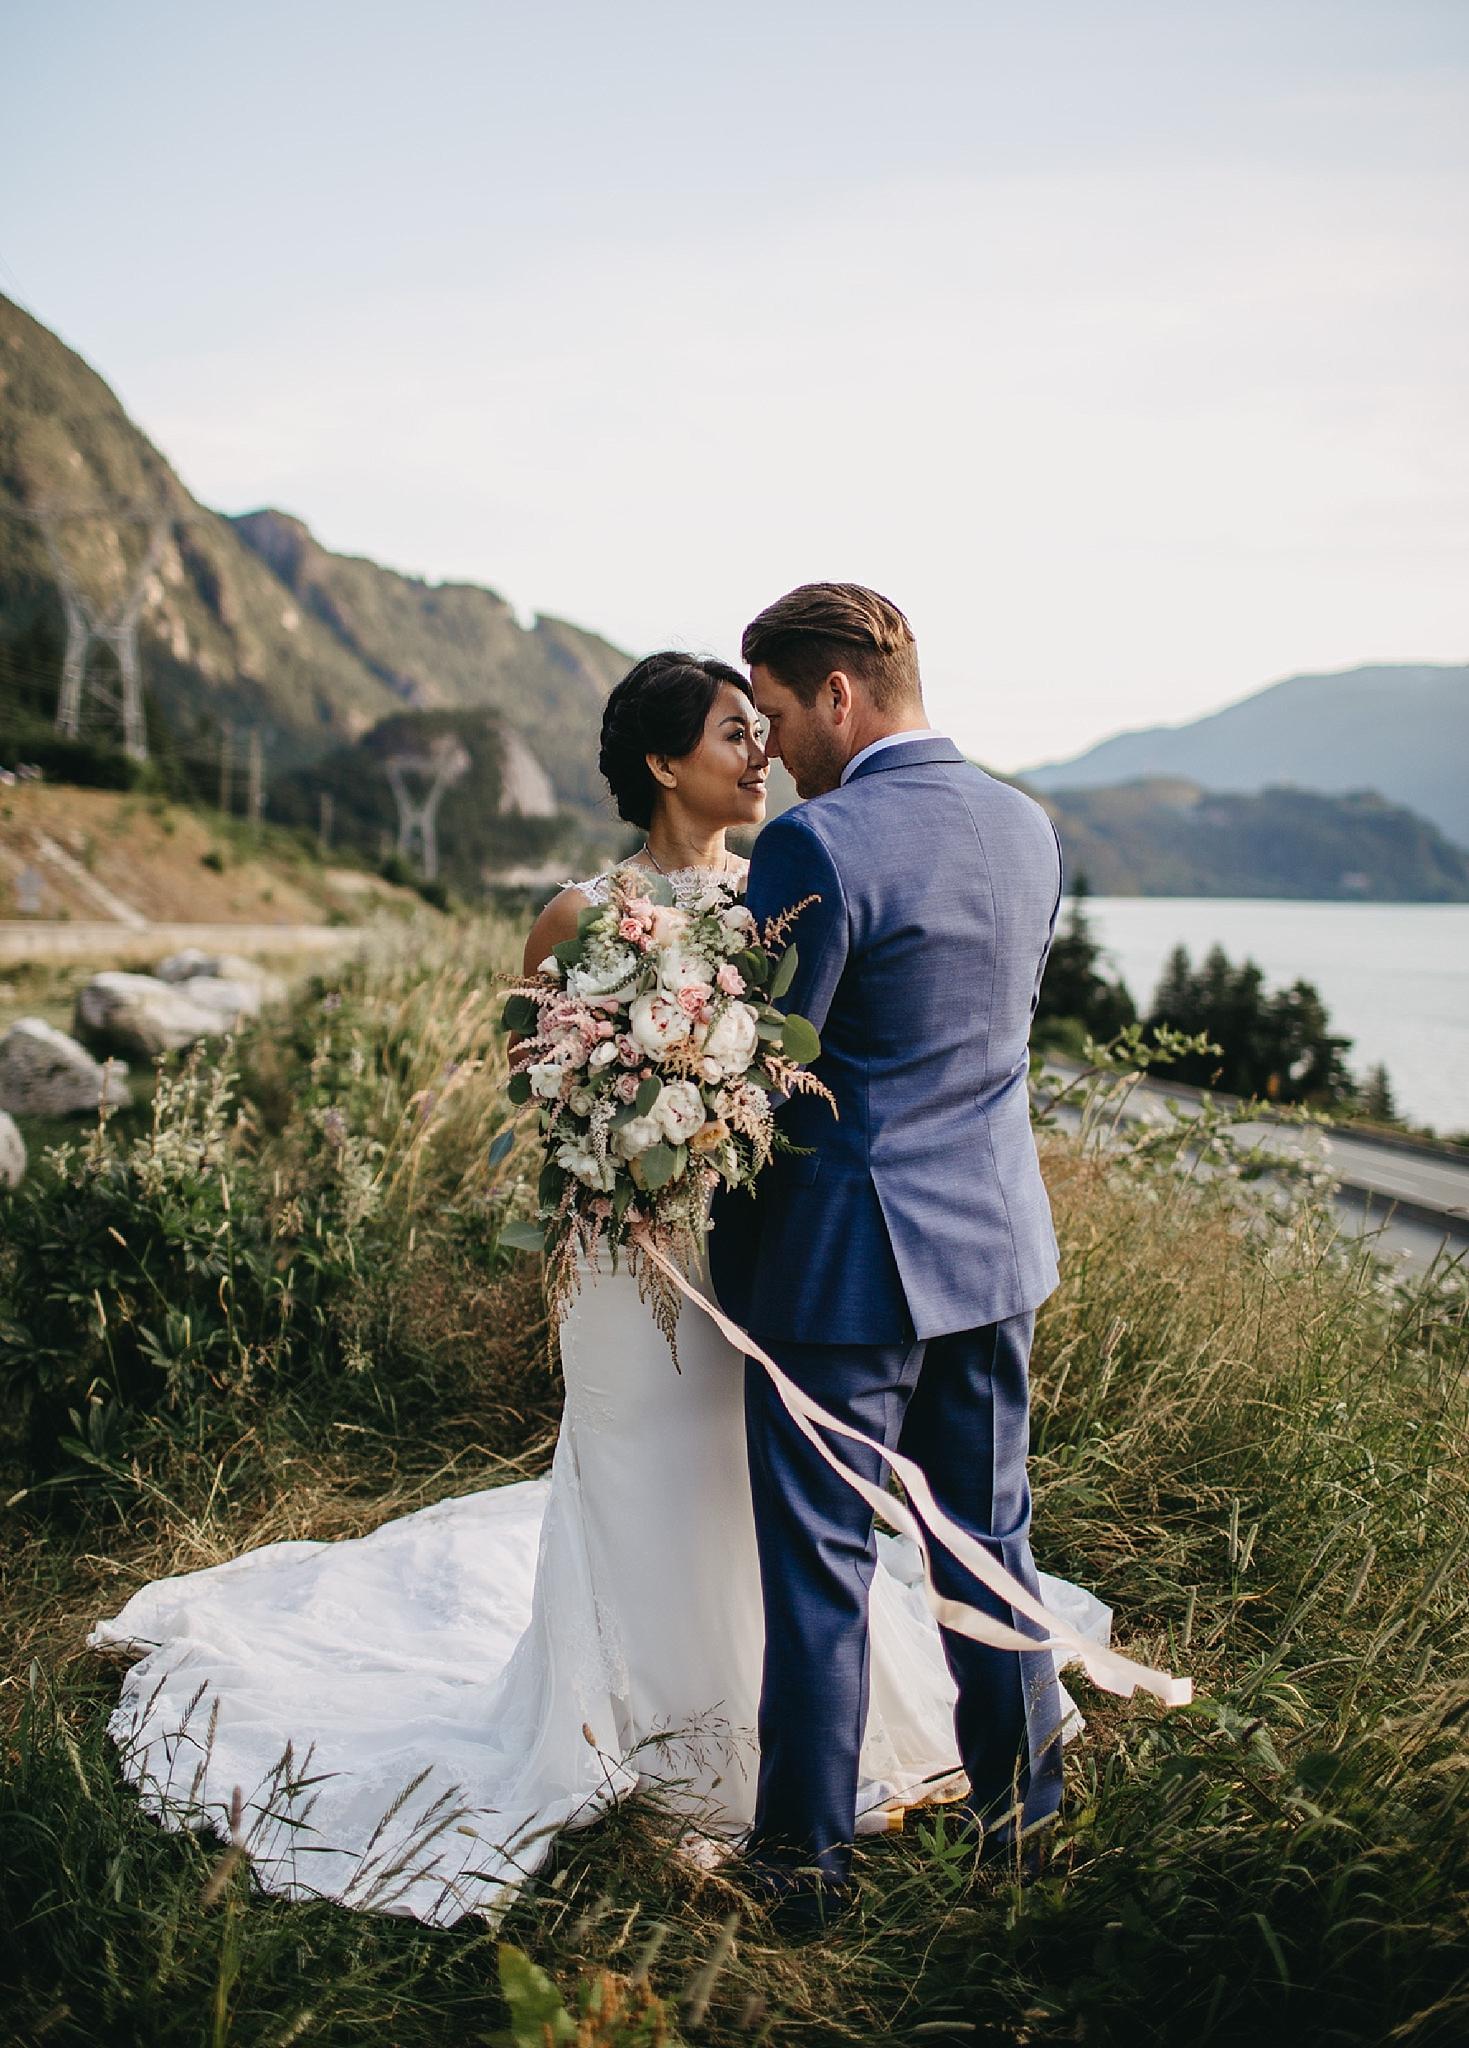 aileen-choi-photo-hart-house-wedding_0114.jpg